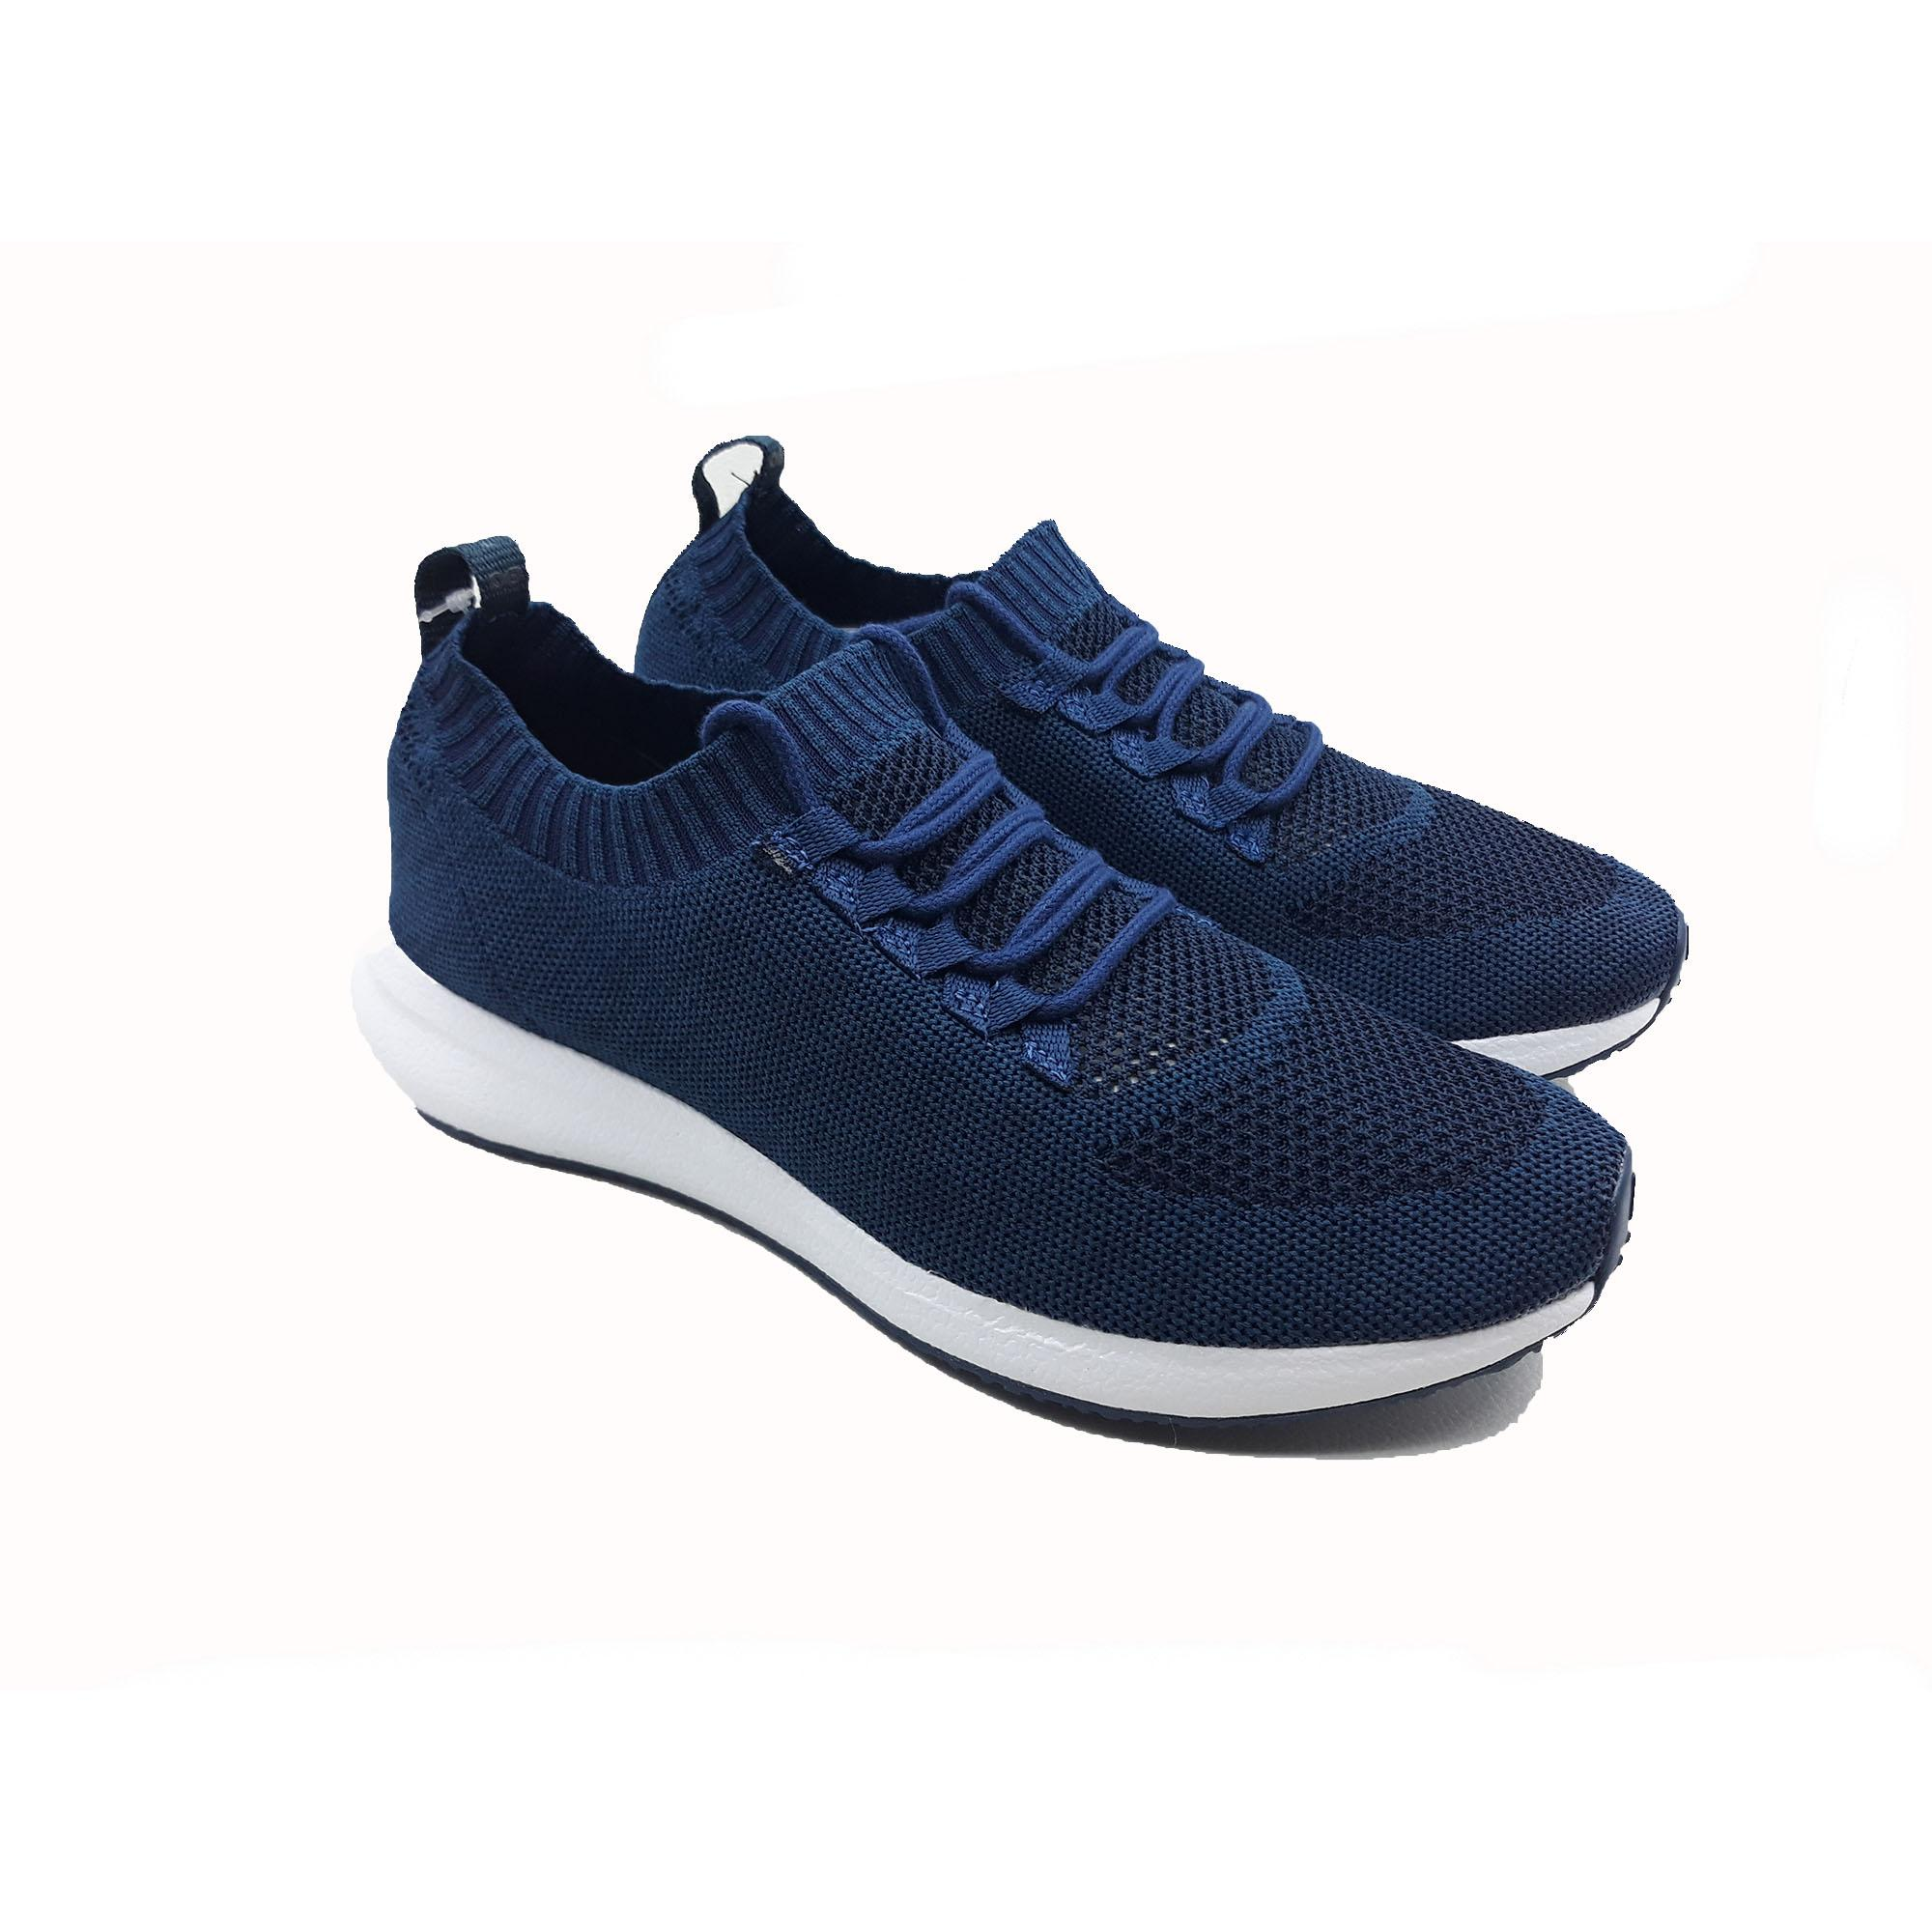 Detail Gambar Sepatu Sneakers Pria Piero Terrasocks Evo Deep - Navy Sea  White Terbaru ba1d0d4044